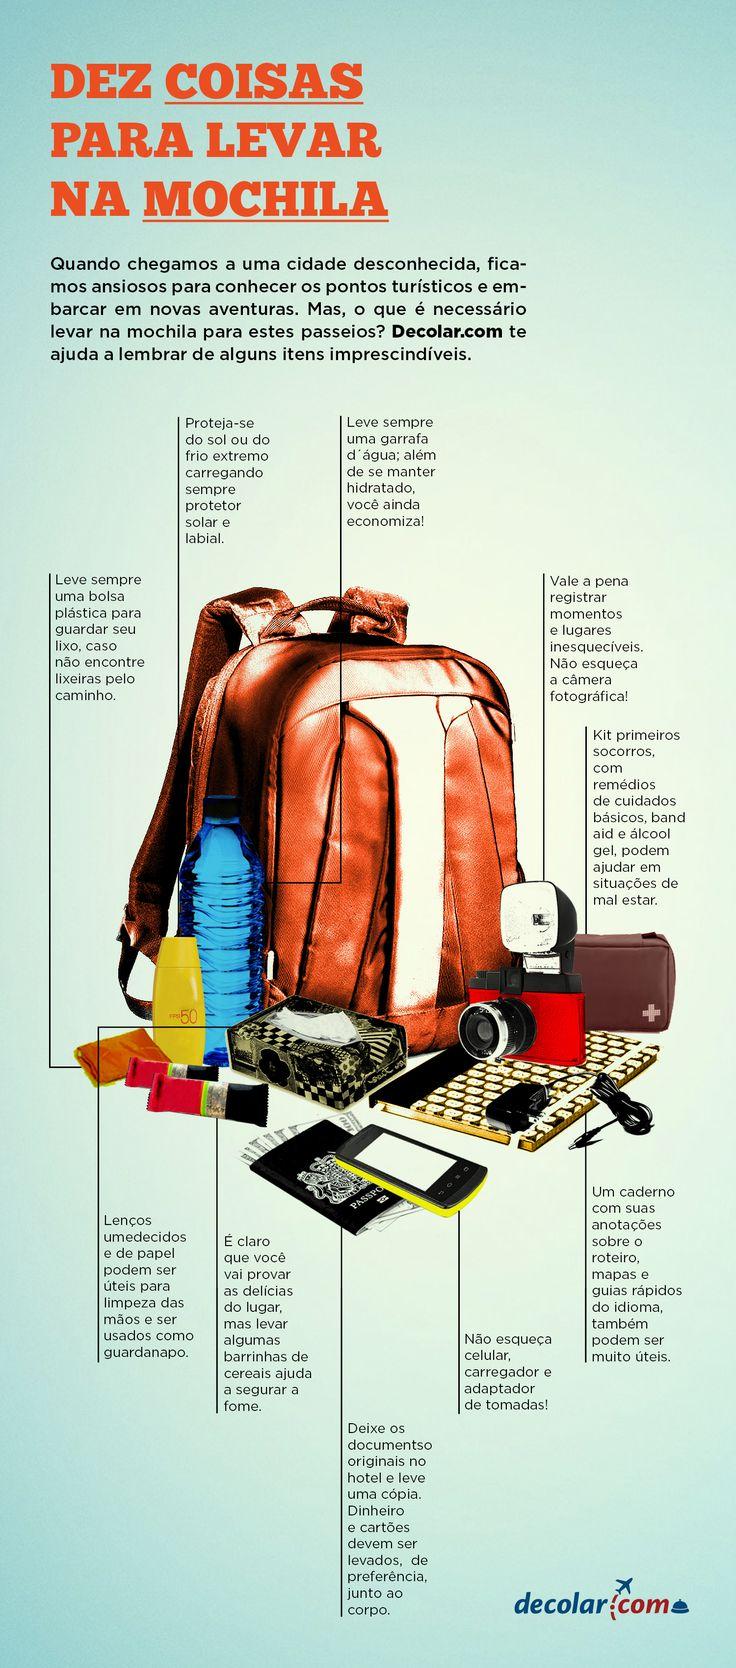 Dez coisas para levar na mochila #Decolar